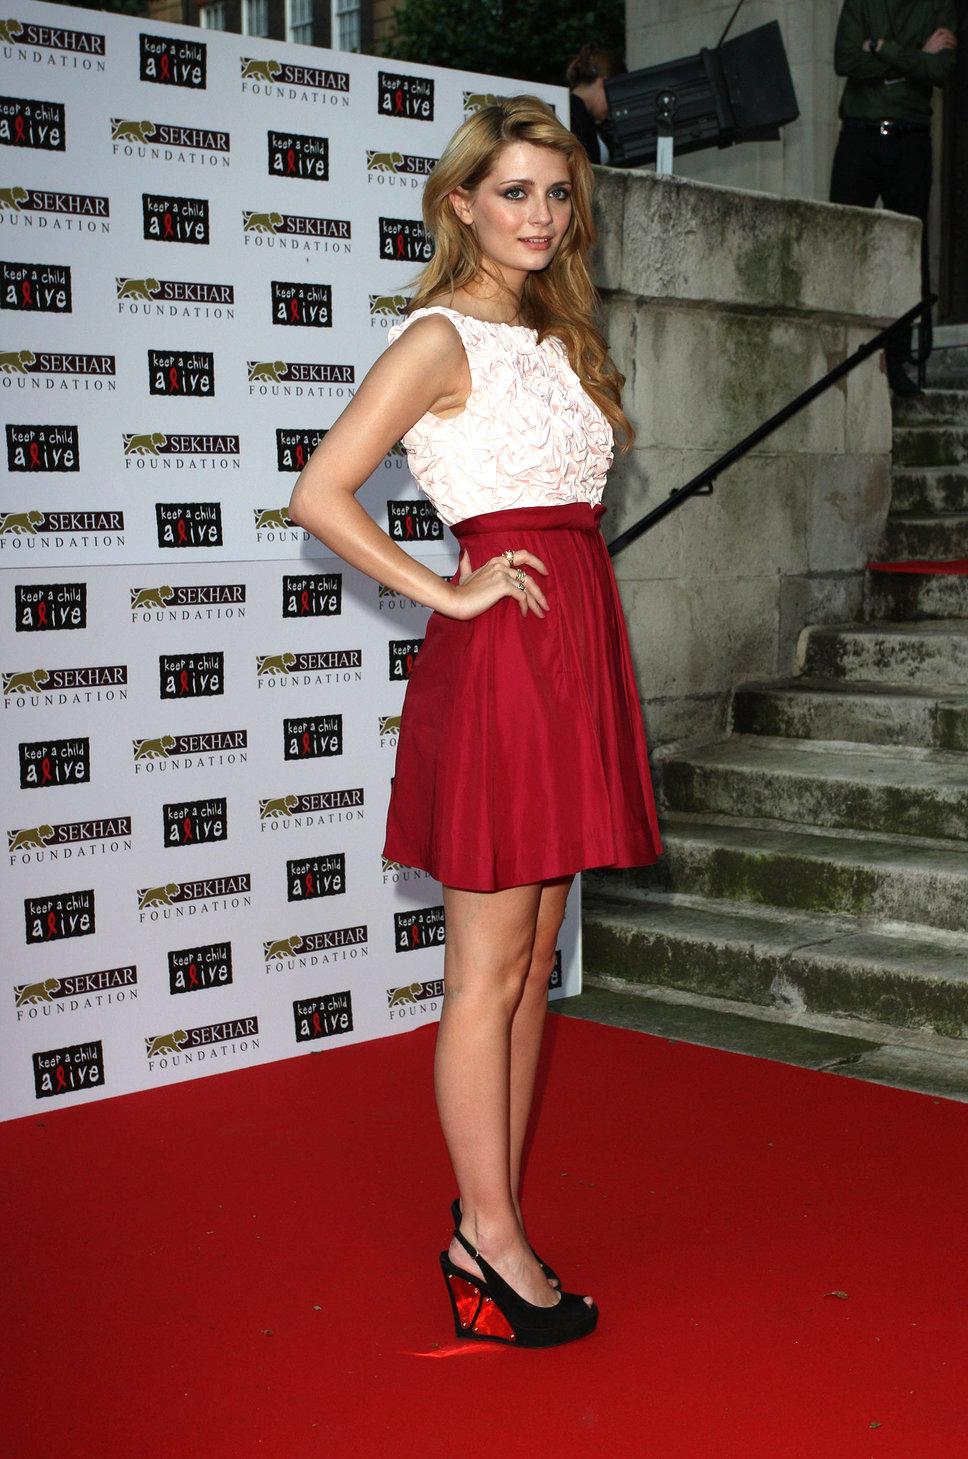 mischa_barton_wedges_red_skirt